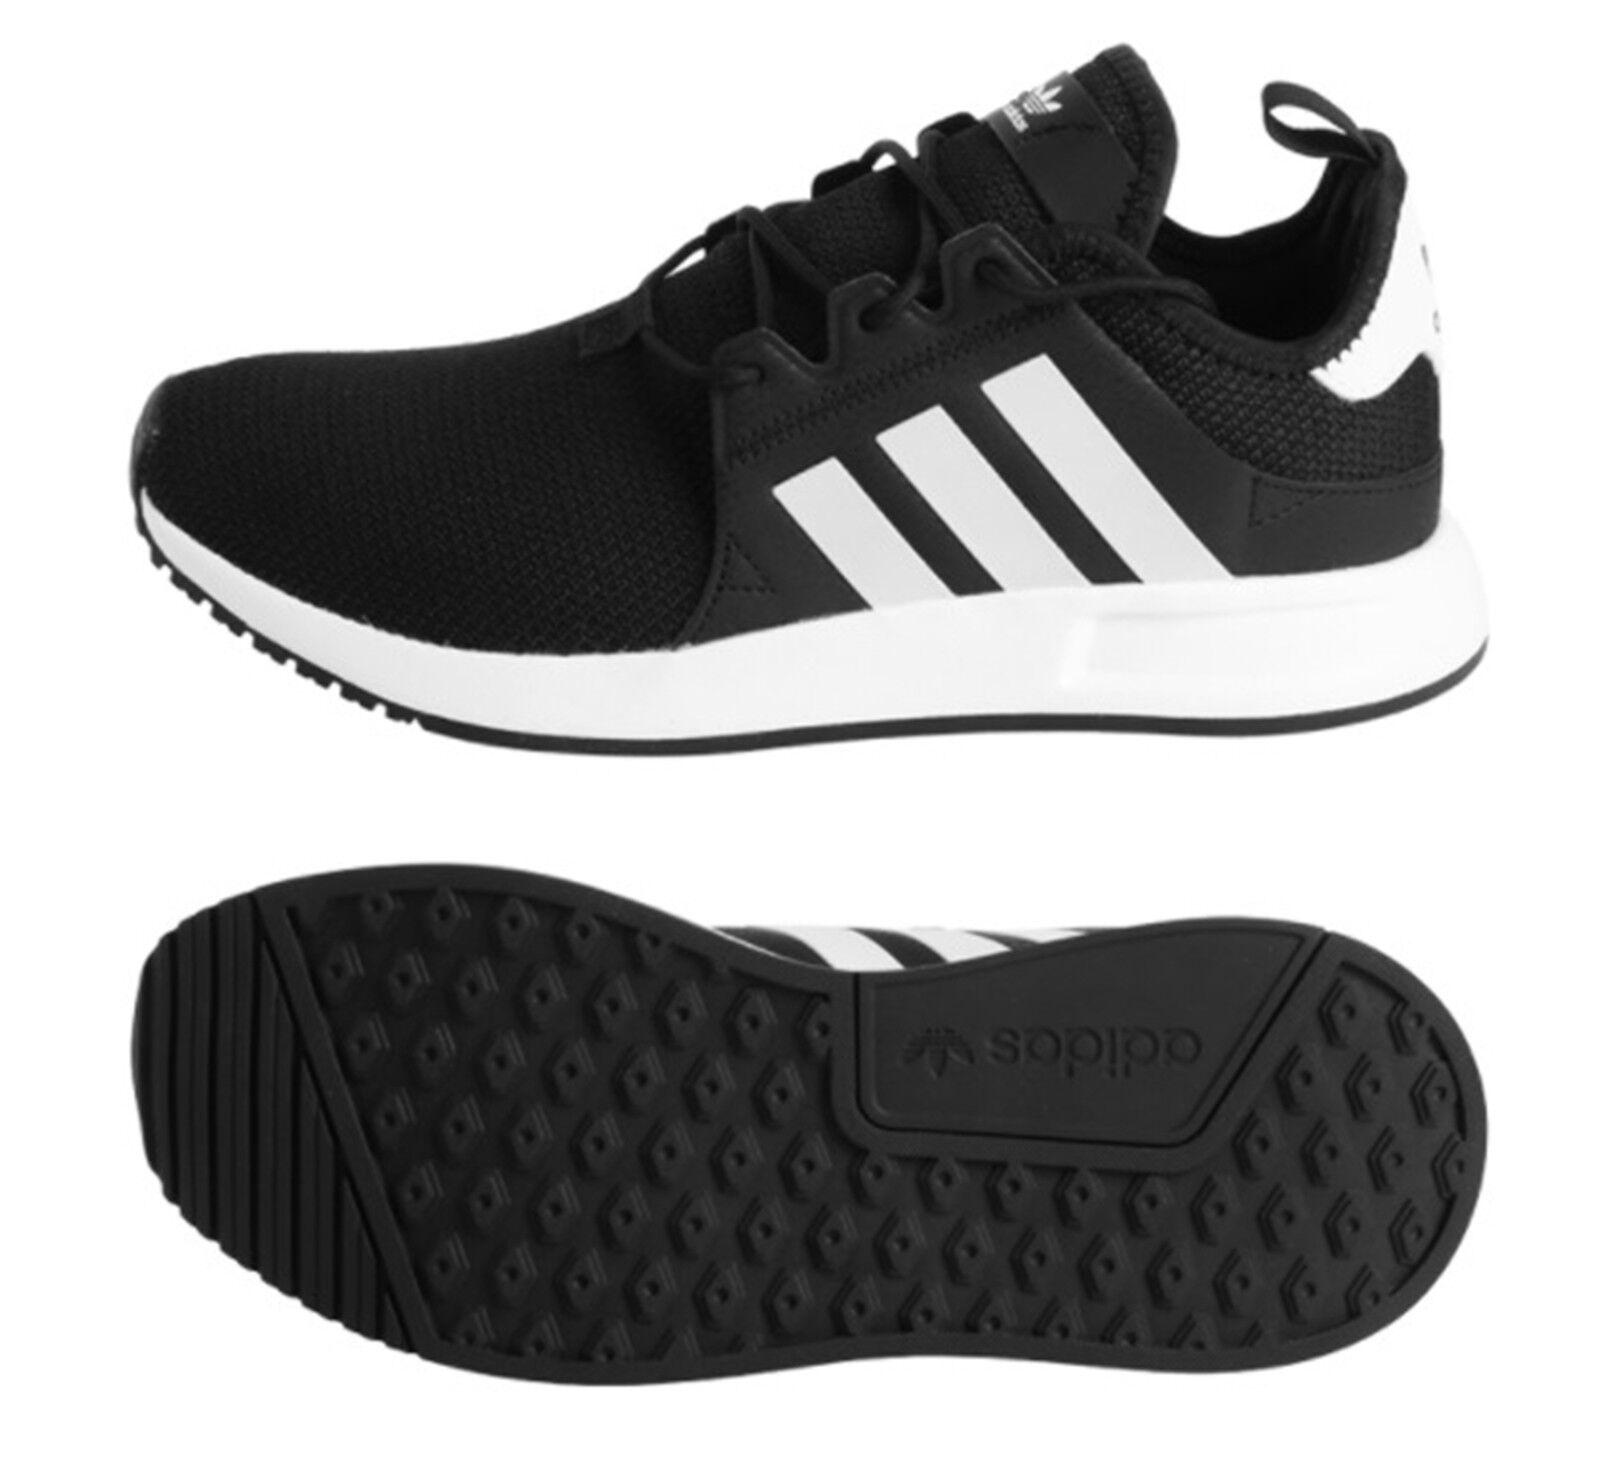 Adidas Hommes Original X PLR Chaussures d entraînement Running Black Sneakers GYM Shoe CQ2405